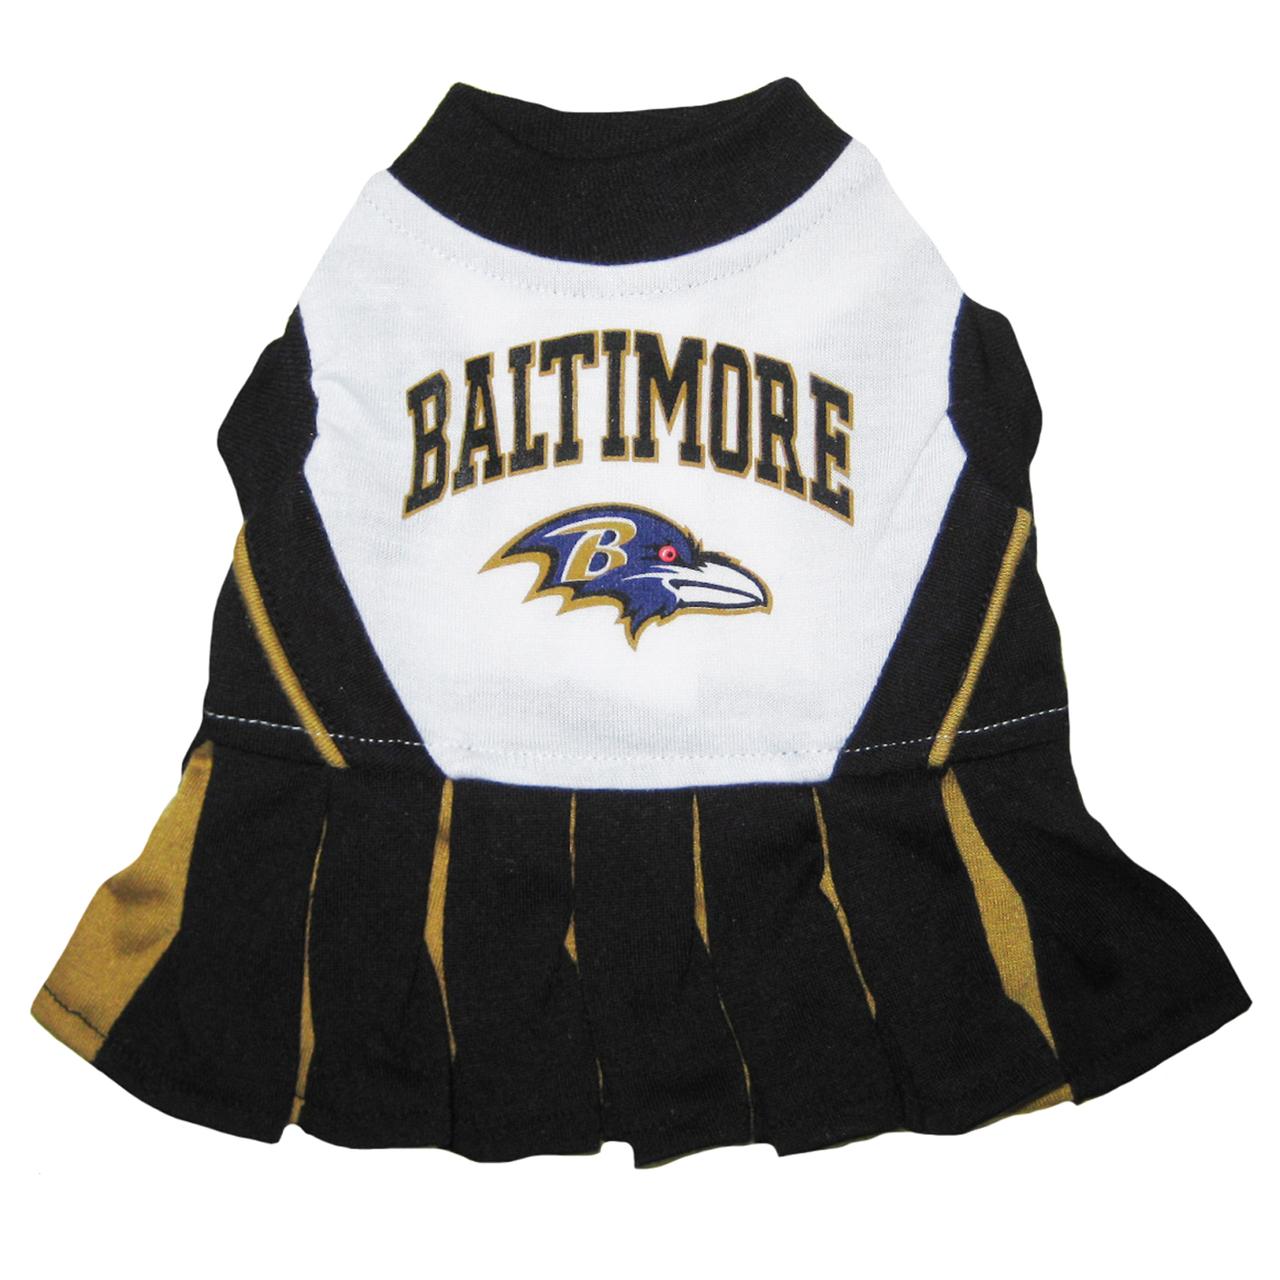 Hot Dog Baltimore Ravens NFL Football Pet Cheerleader Outfit